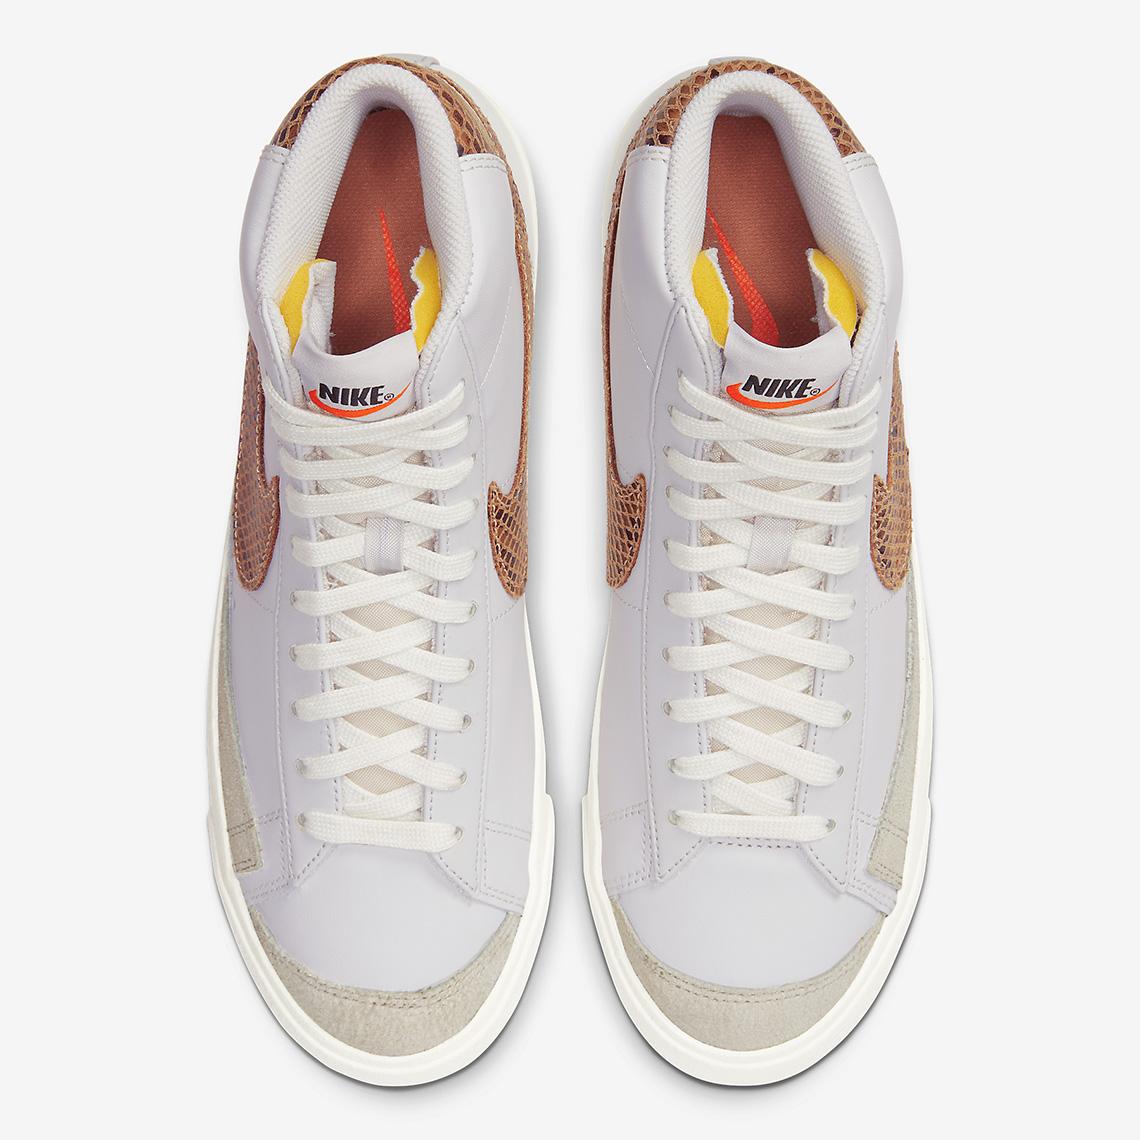 "Nike Brings Back the Snakeskin Steez With Blazer Mid '77 Vintage ""Python"""